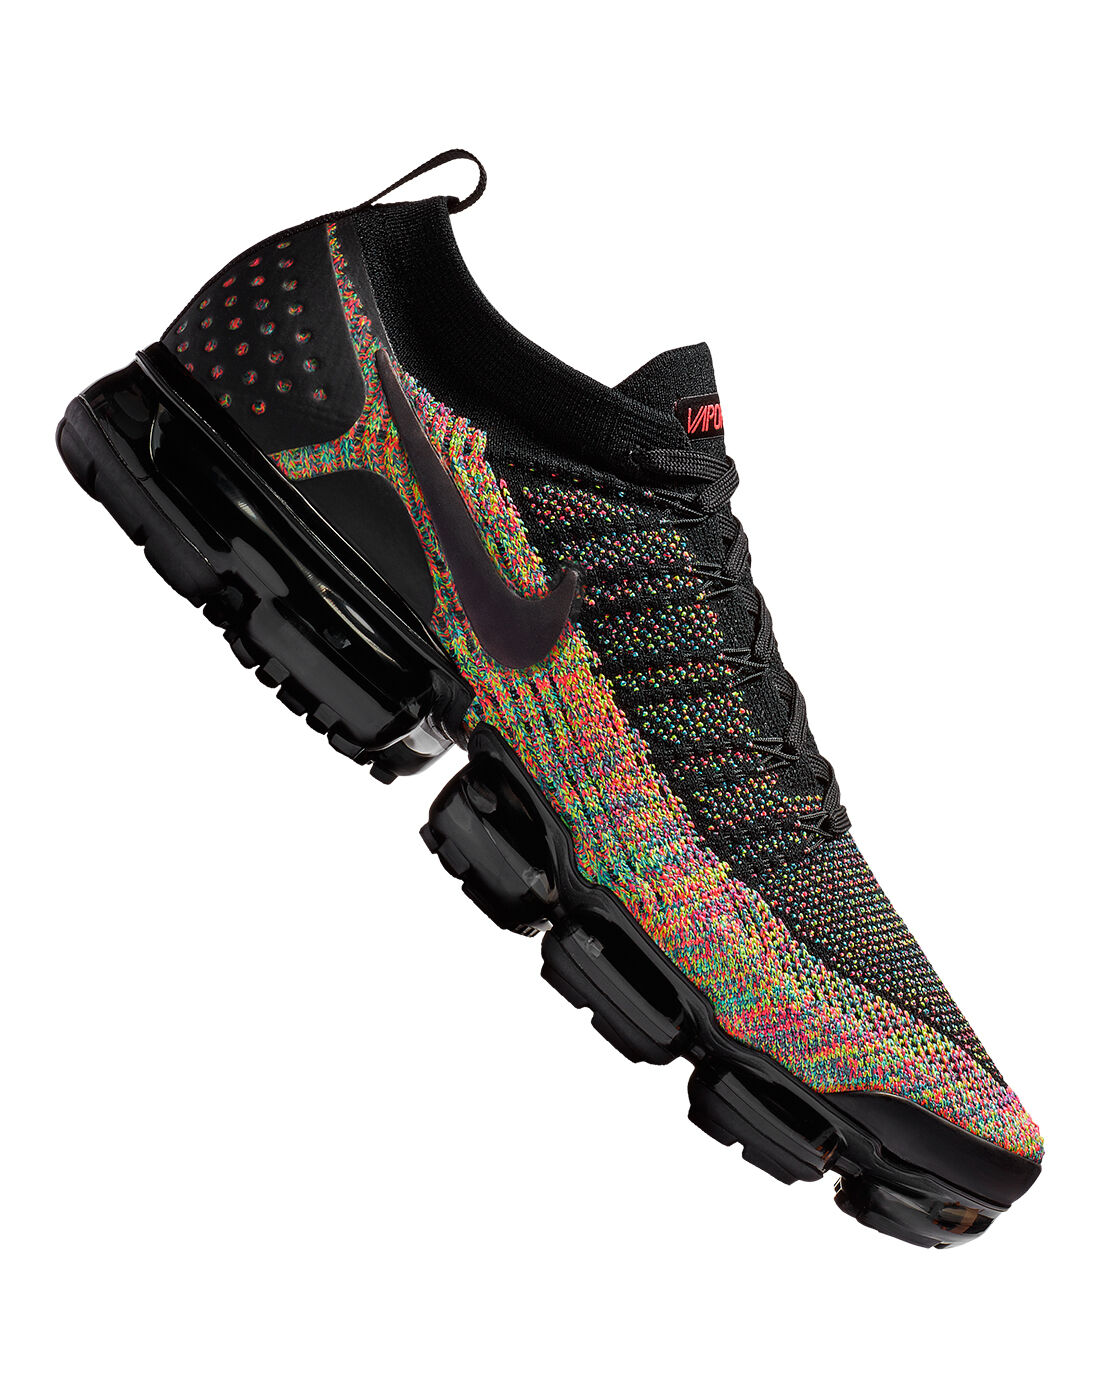 Multi-coloured Nike Vapormax Flyknit